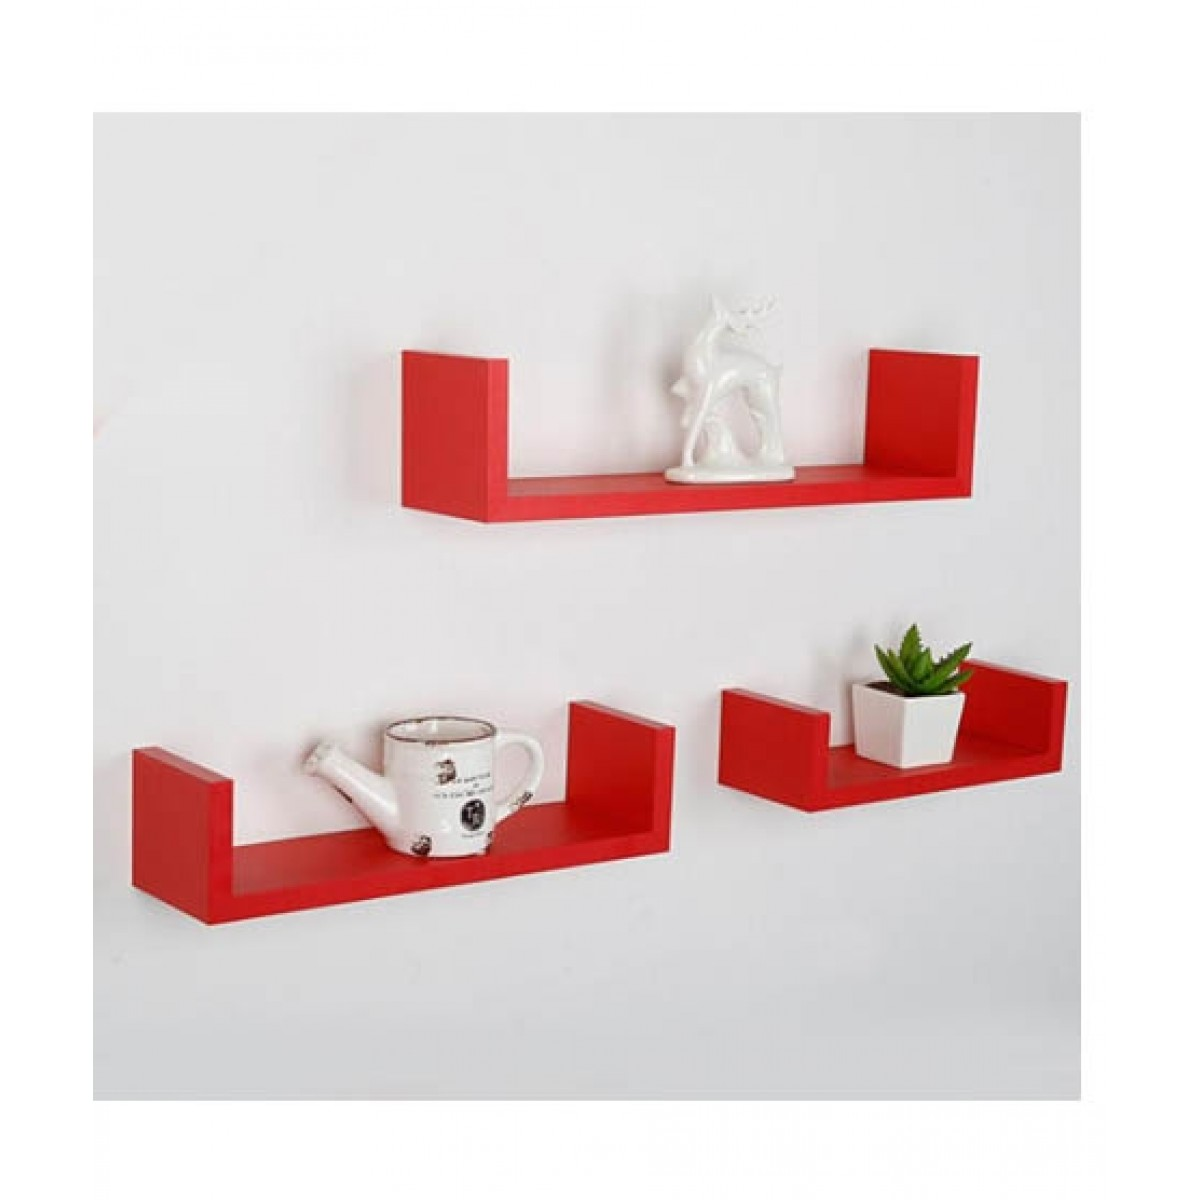 Wood World Wall Hanging U Shelf Red